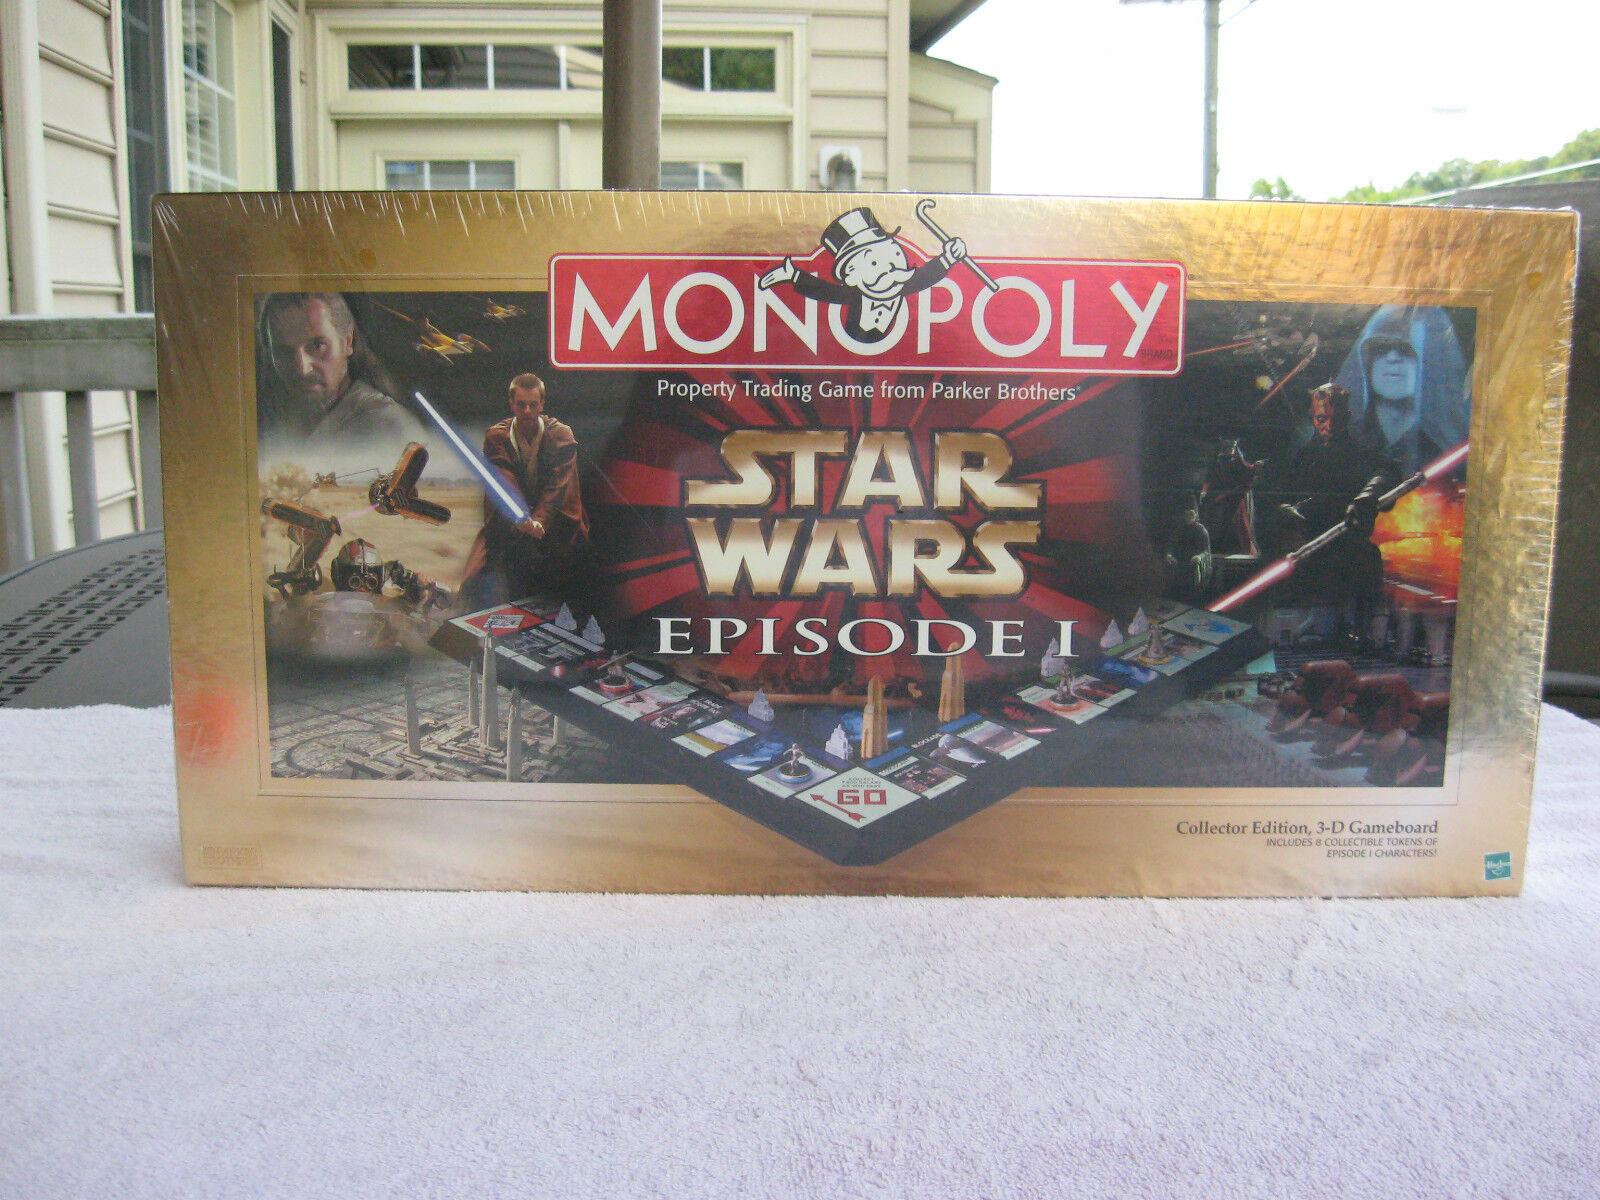 Monopoly Star Wars Episode 1  Collectors Edition 1999 nouveau & FACTORY SEALED  magasin pas cher